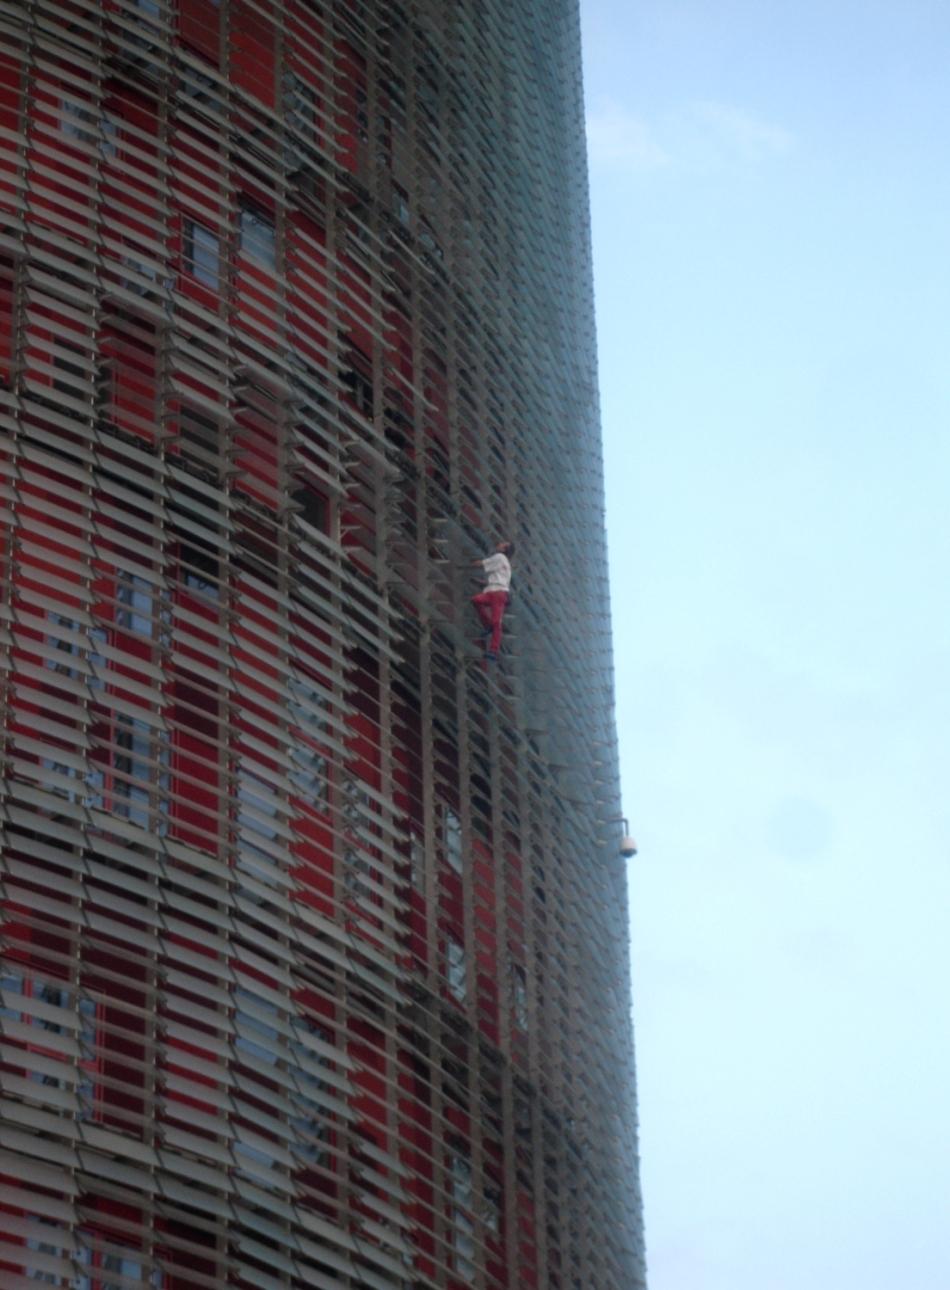 escaladarea caldirii torre agbar din barcelona